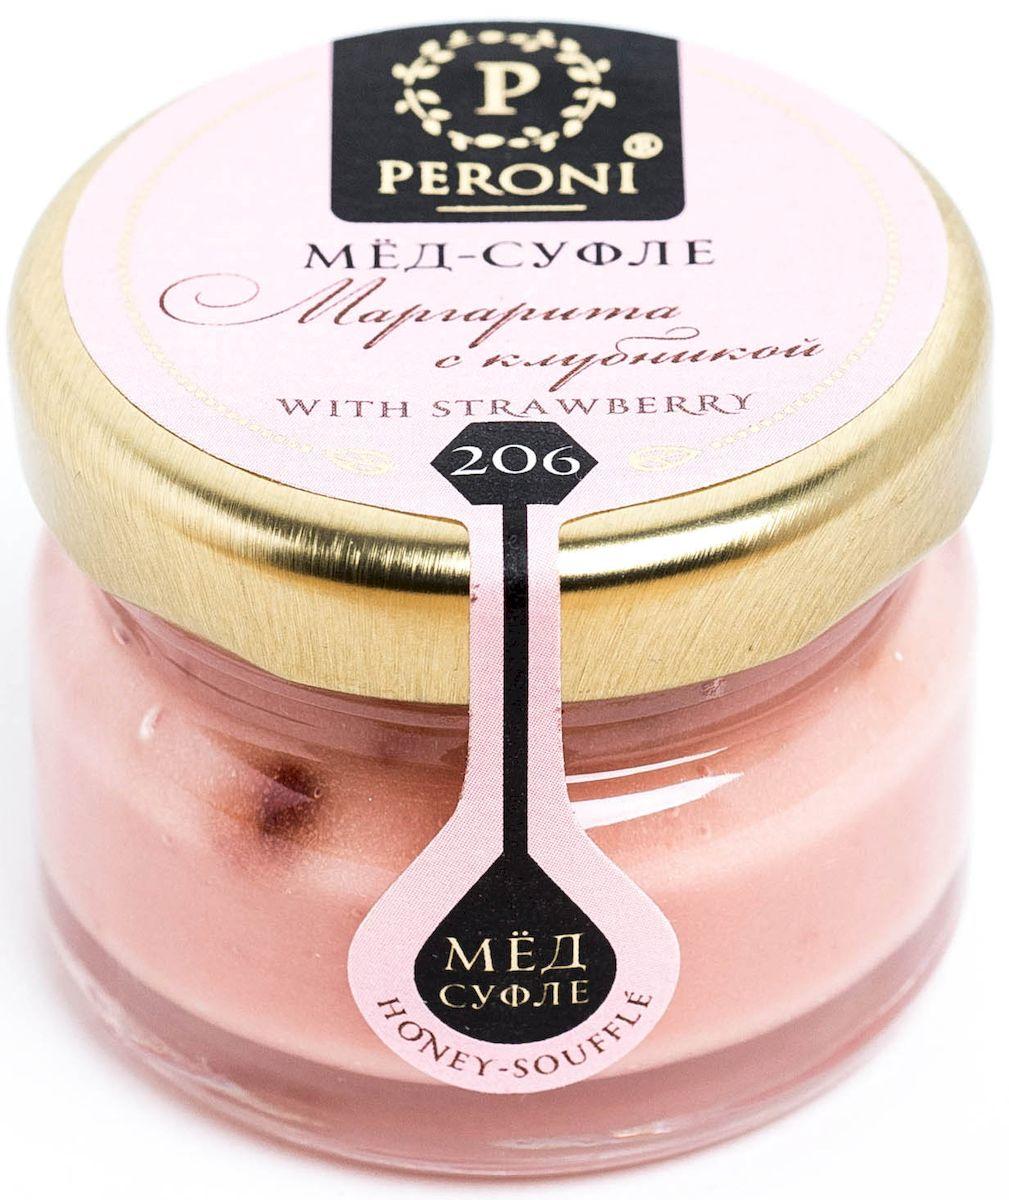 Peroni Маргарита с клубникой мёд-суфле, 30 г peroni кедровый орешек мёд суфле 220 г